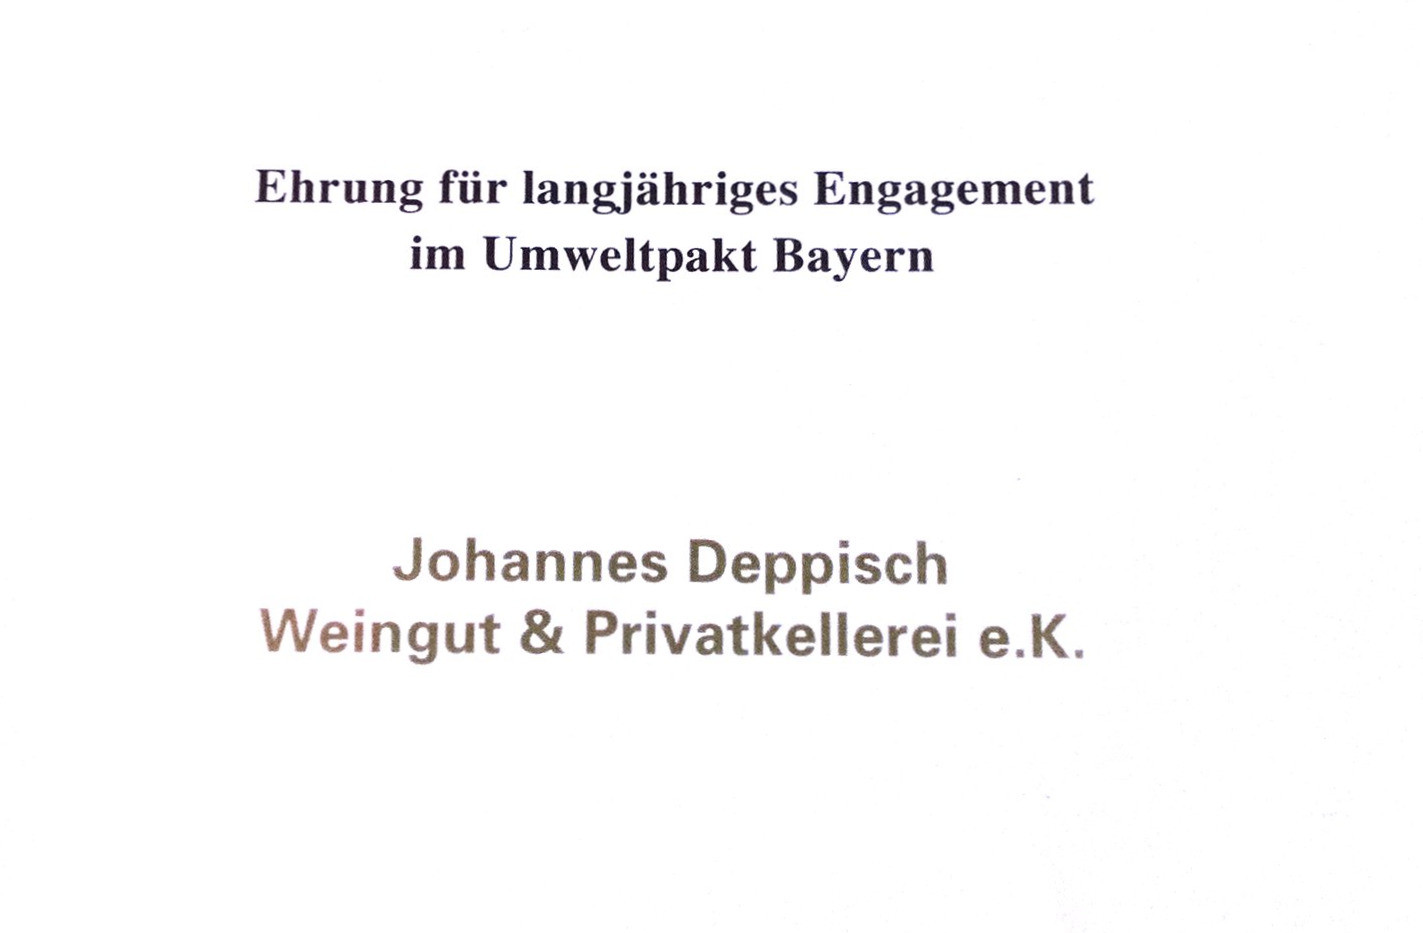 c) Umweltpakt Bayern Urkunde